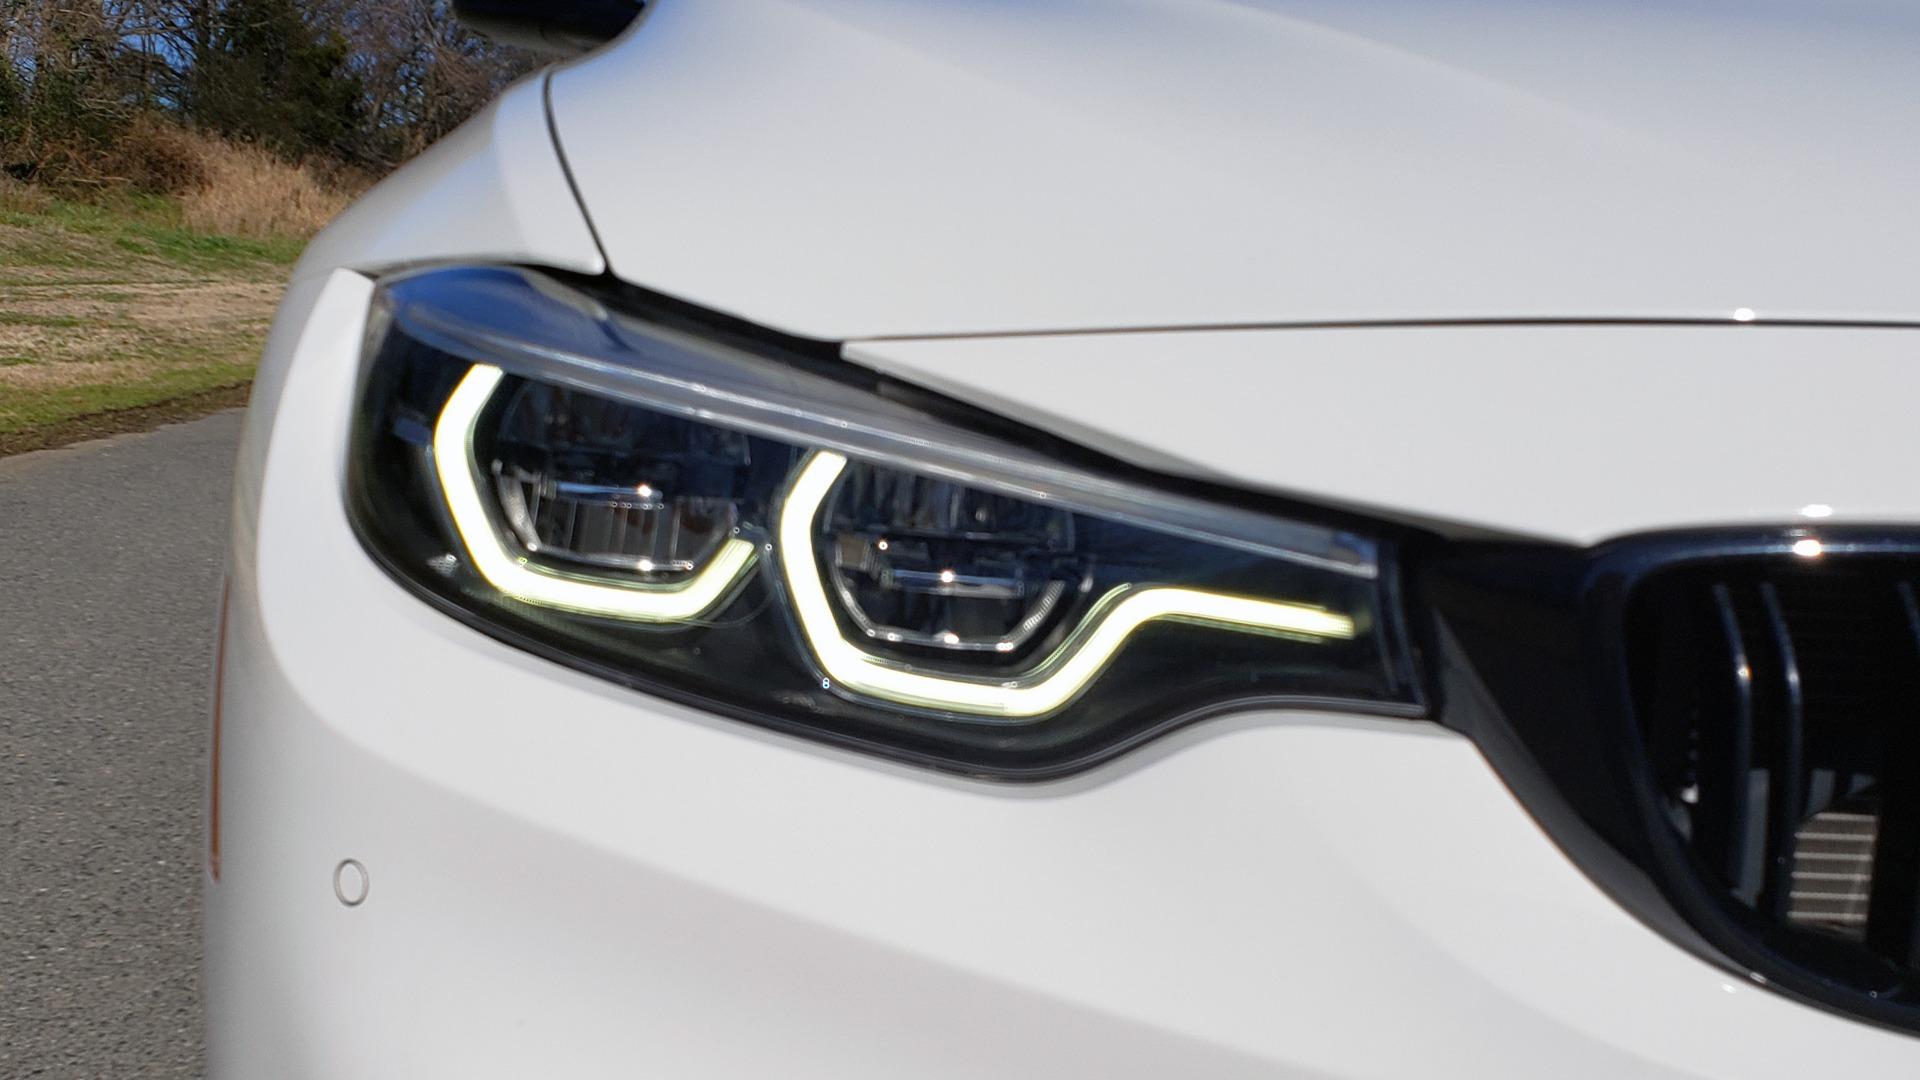 Used 2018 BMW M4 COMP PKG / EXEC / M-DRIVER / PARK CNTRL / ACTIVE BLIND SPOT for sale Sold at Formula Imports in Charlotte NC 28227 13